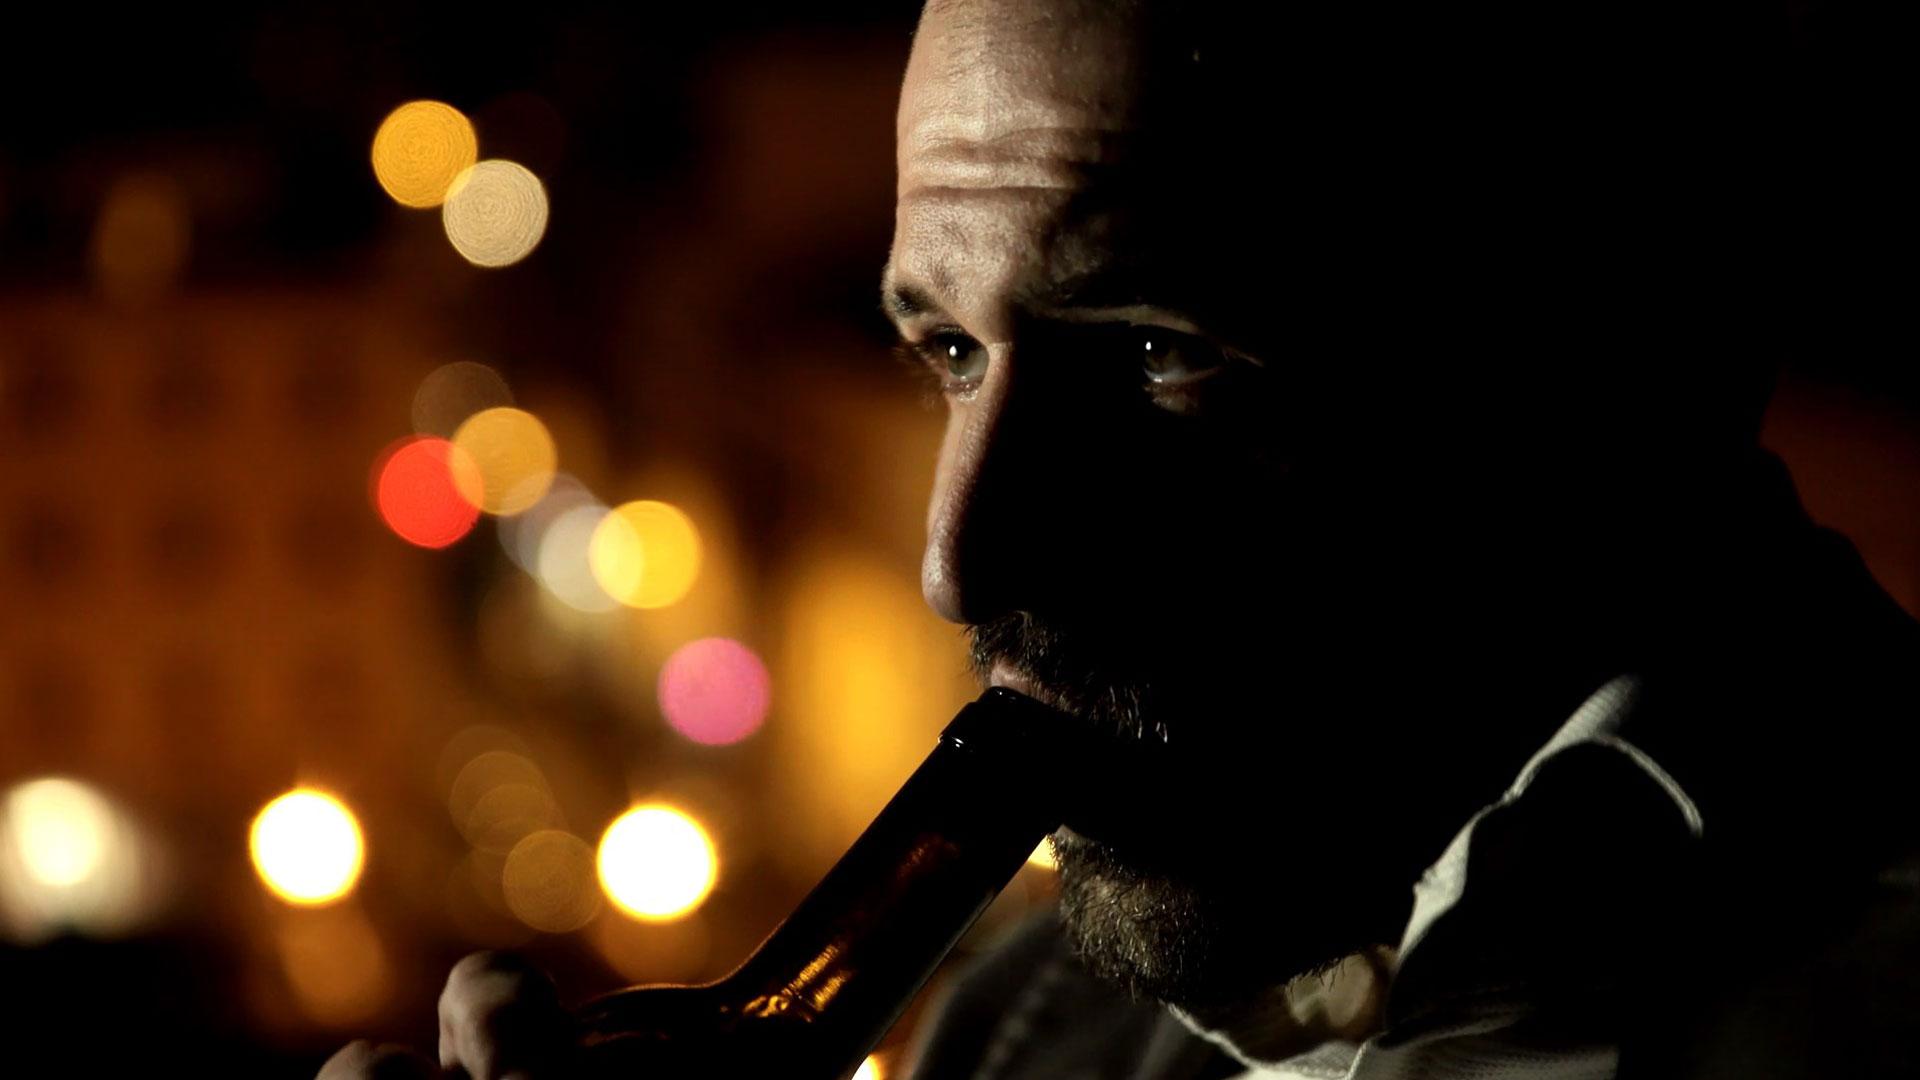 afkicken alcohol